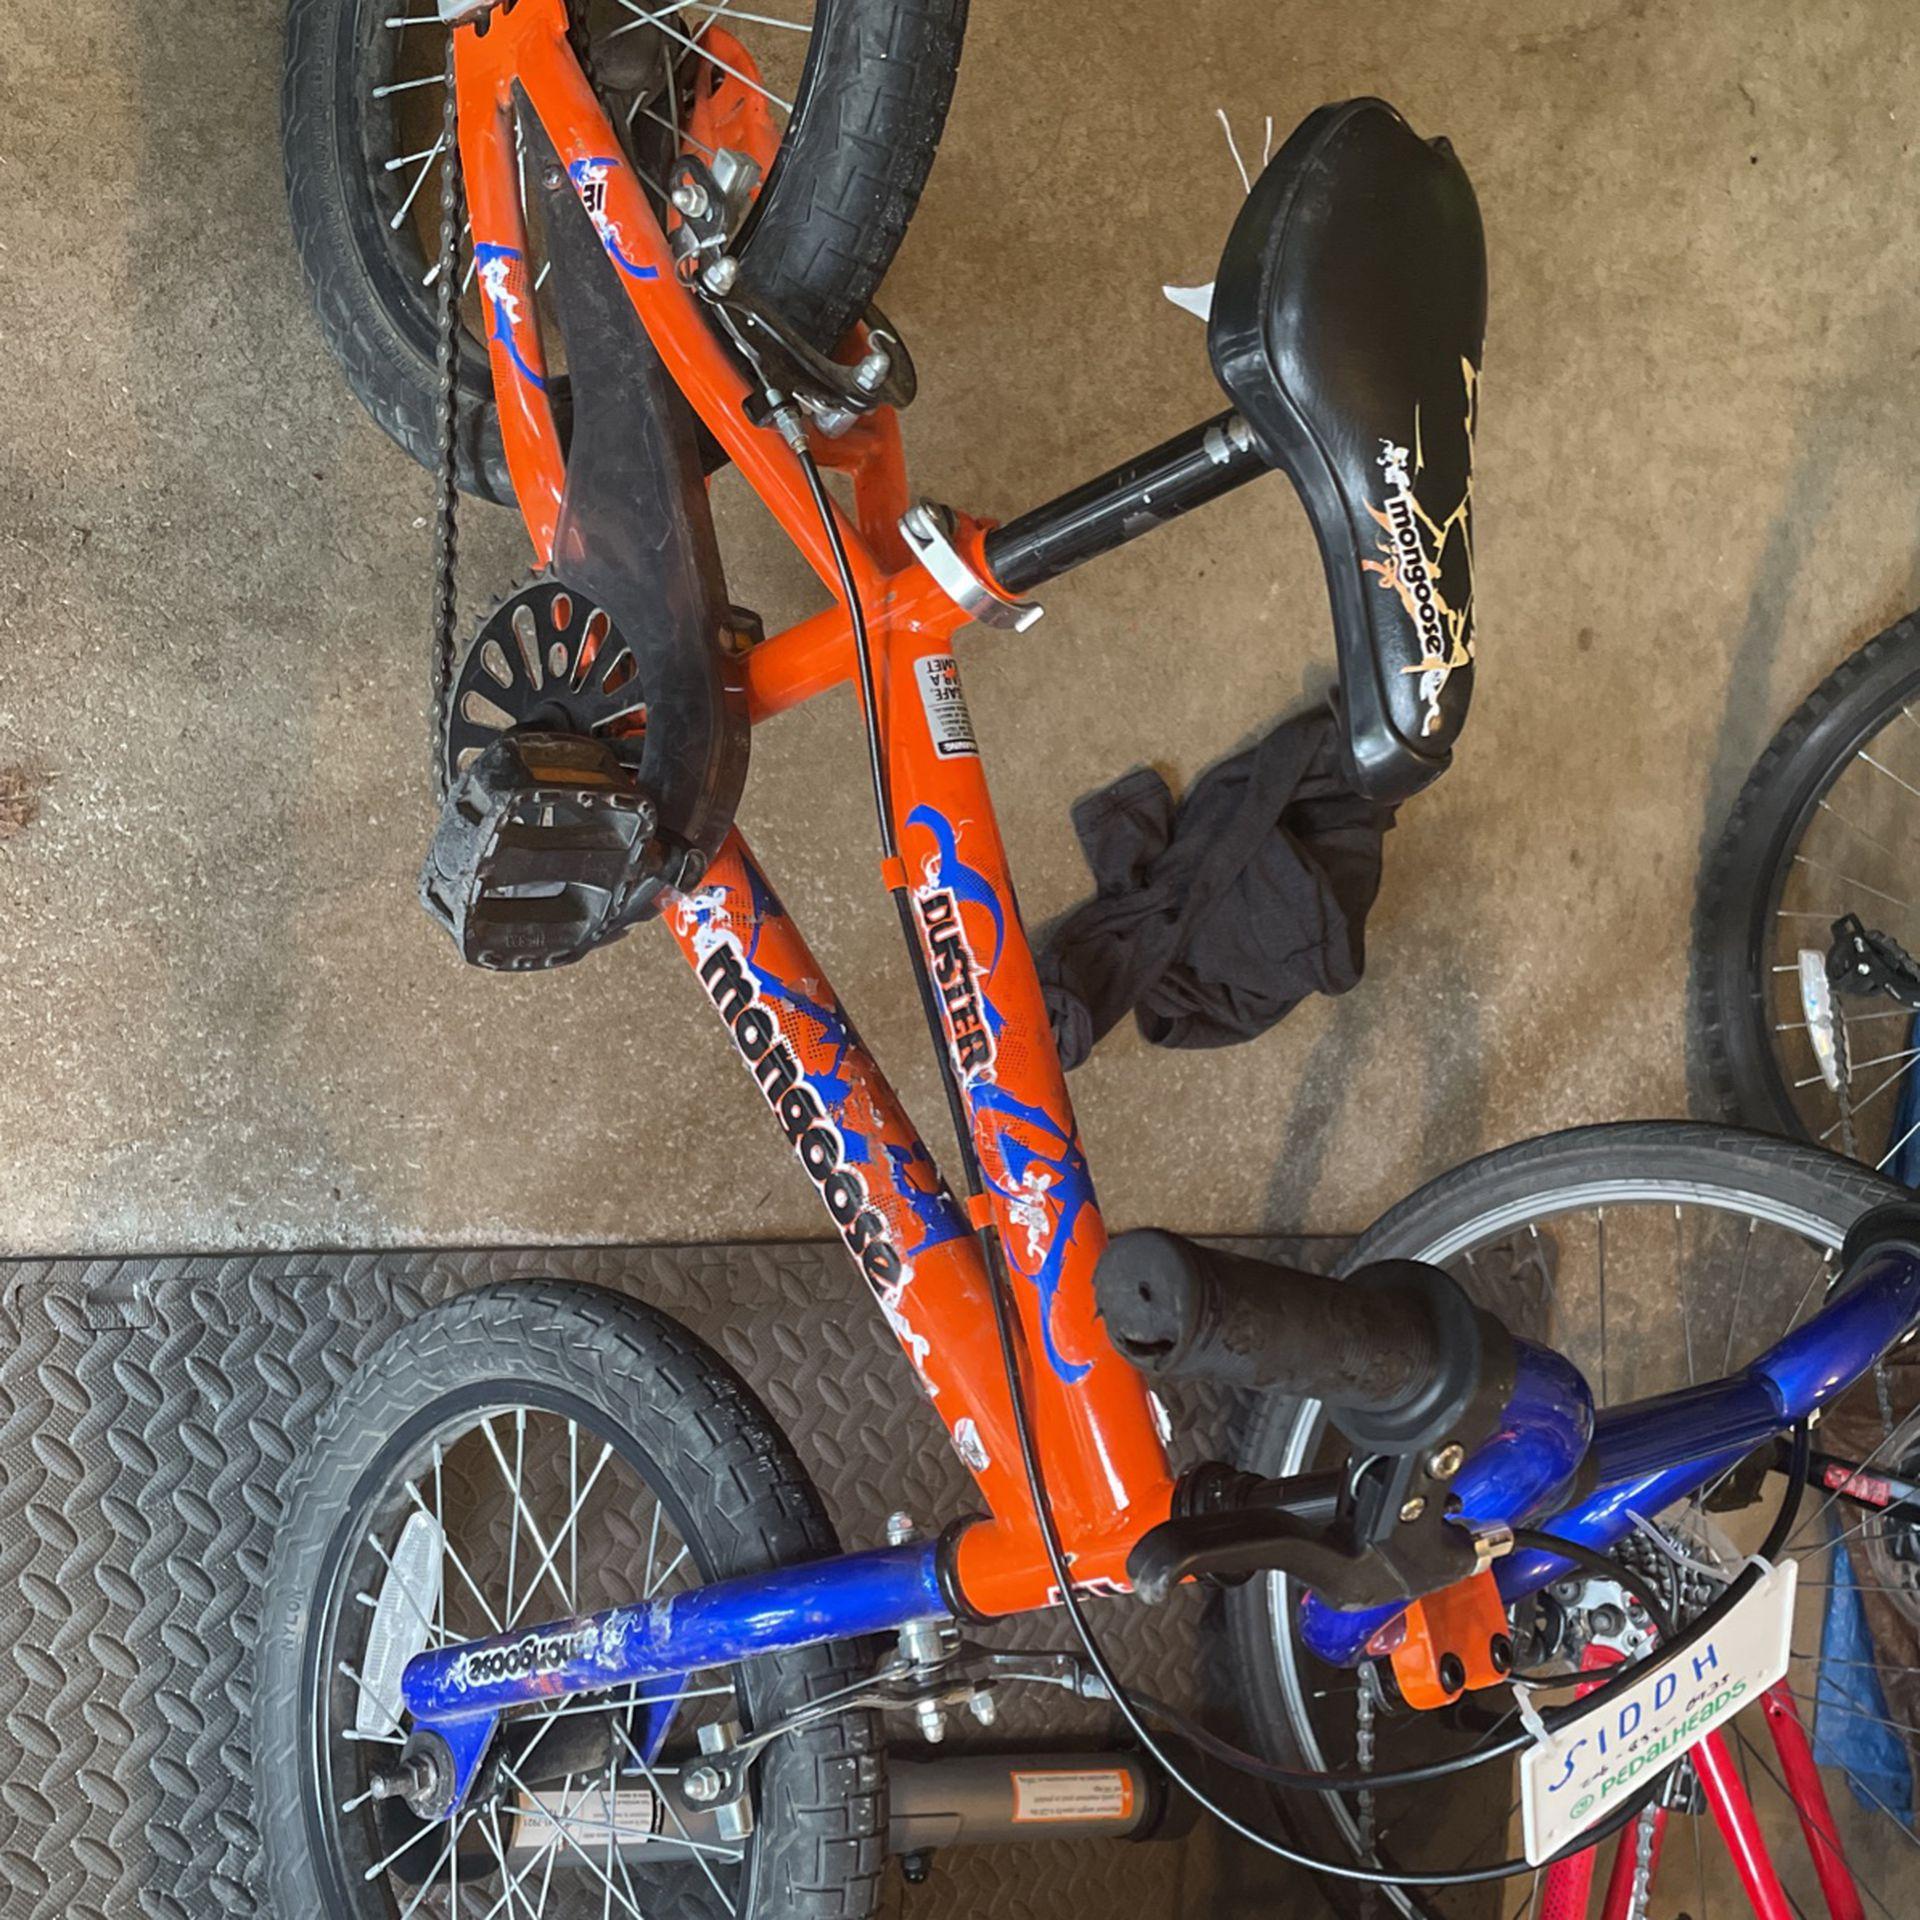 16 Inch Mongoose duster Bike